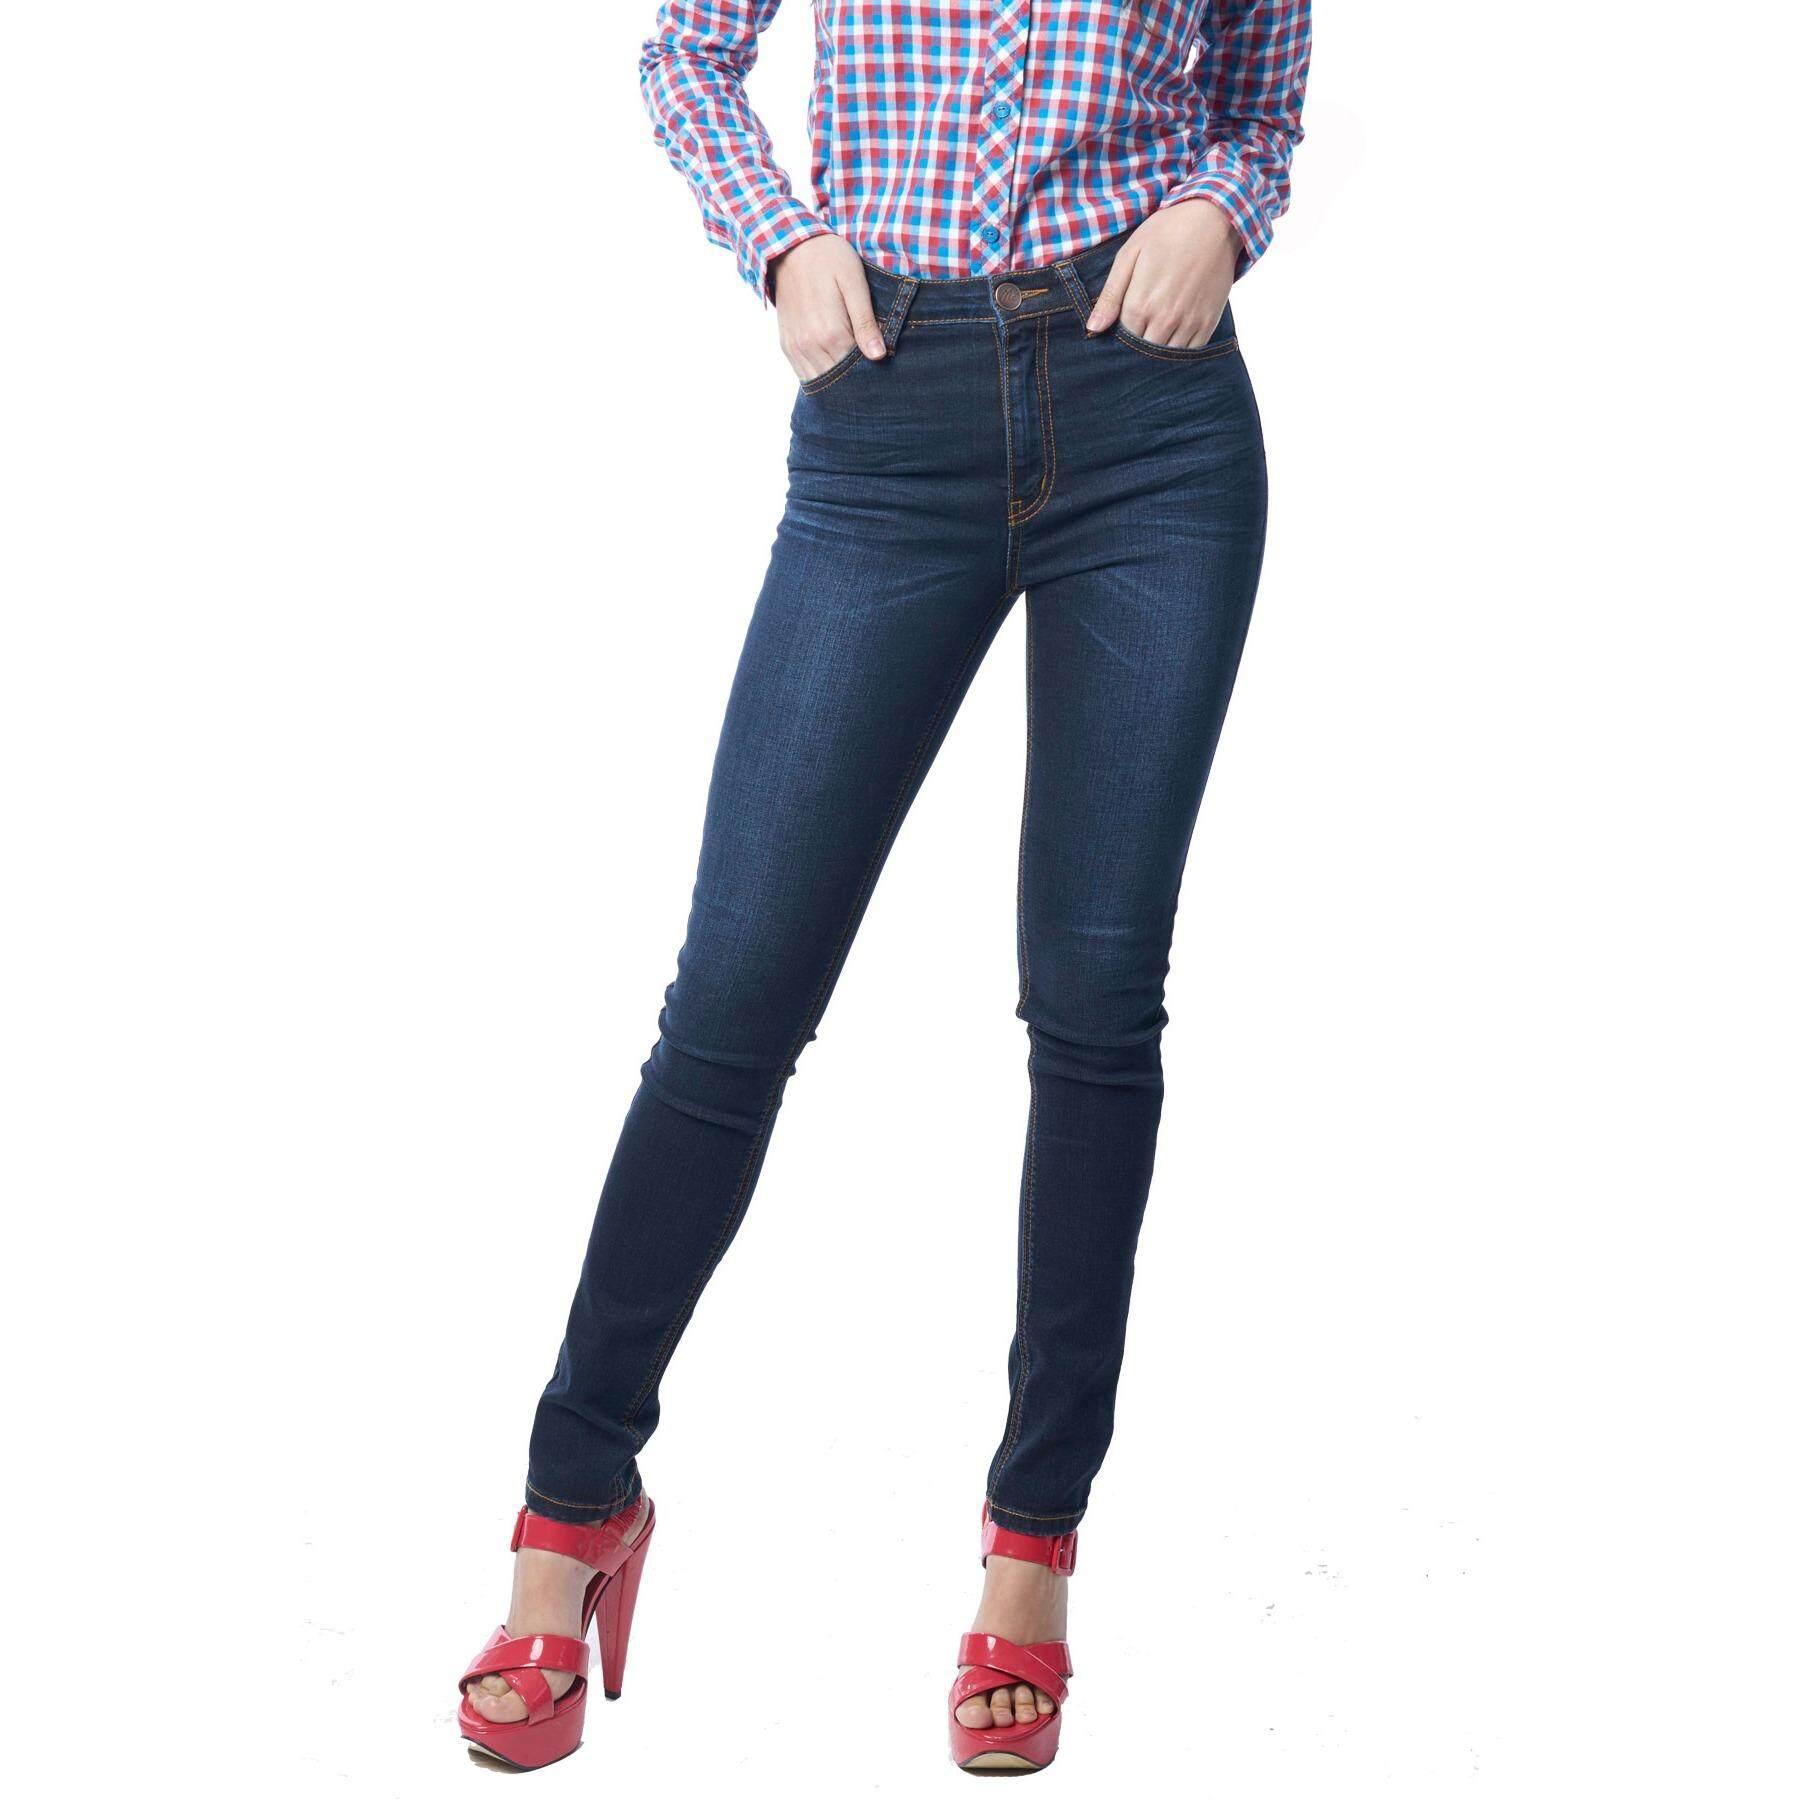 Mc Jeans Skinny Jeans รุ่น Mad718200 สีน้ำเงิน ใหม่ล่าสุด